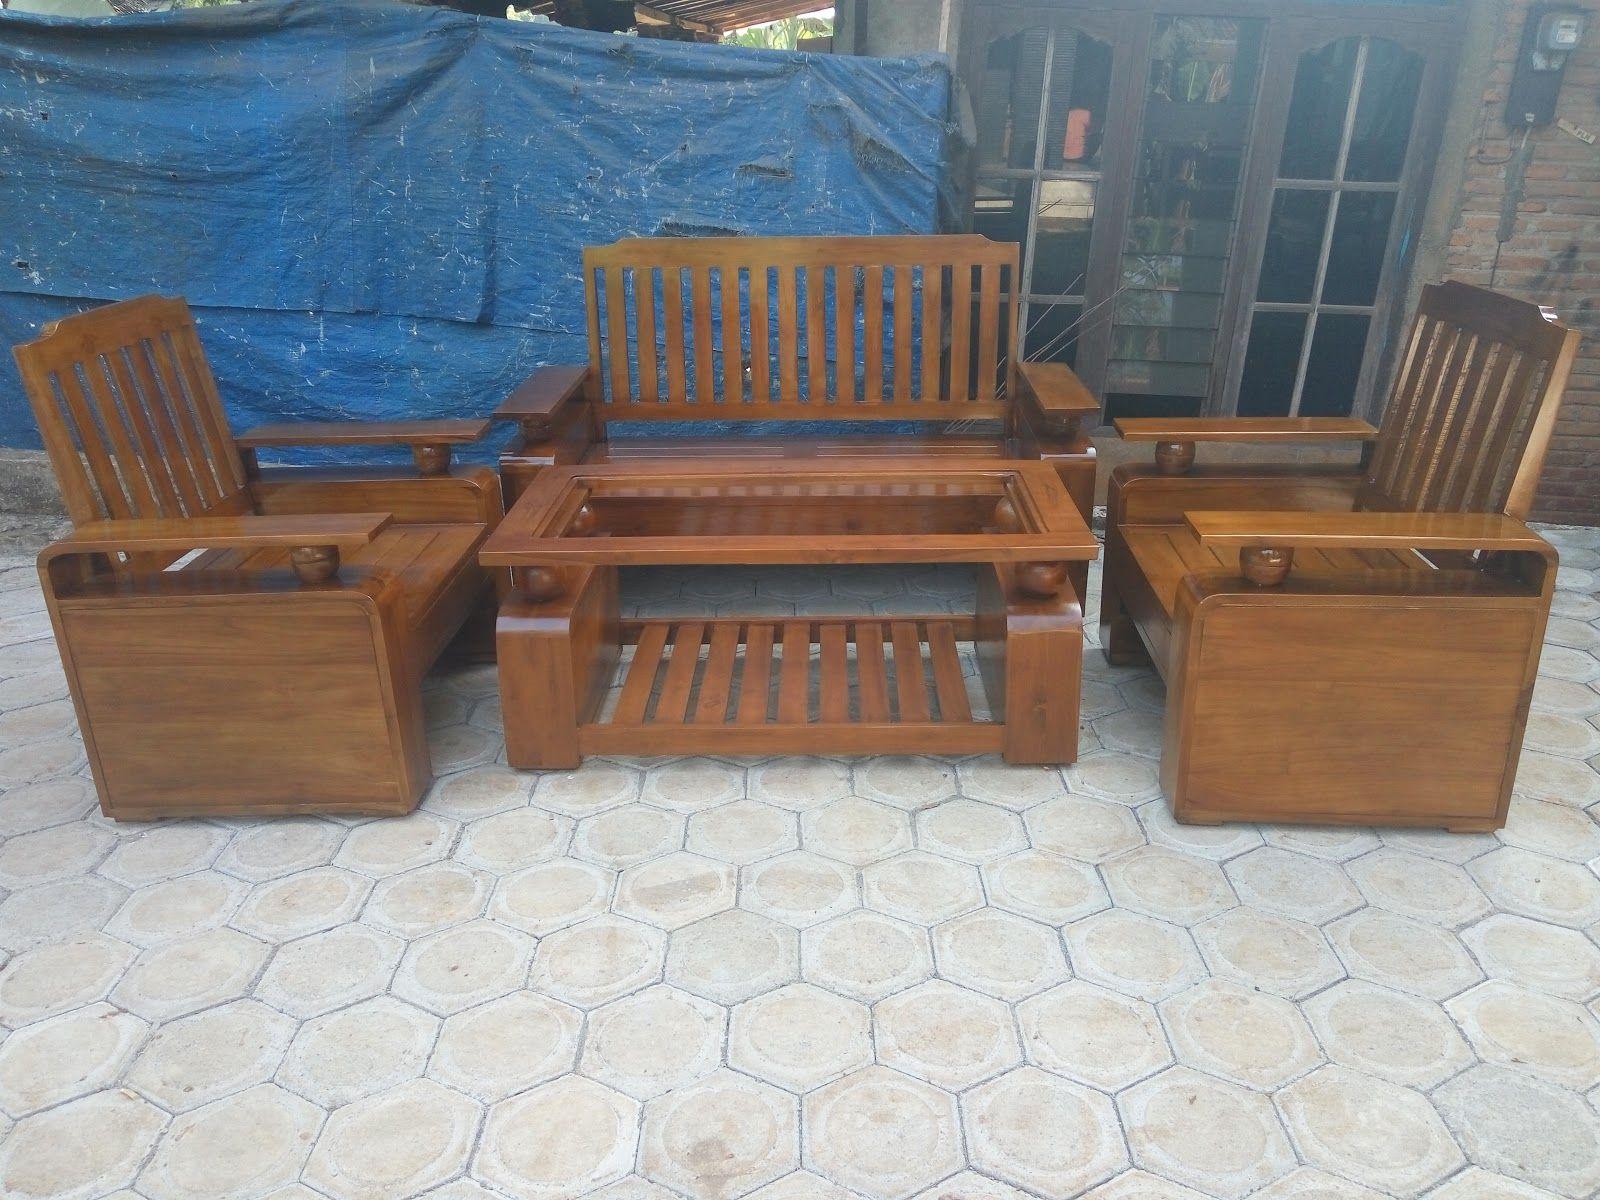 Kursi Minimalis Terbaru Kursi Tamu Kursi Santai Kursi Sofa Kursi